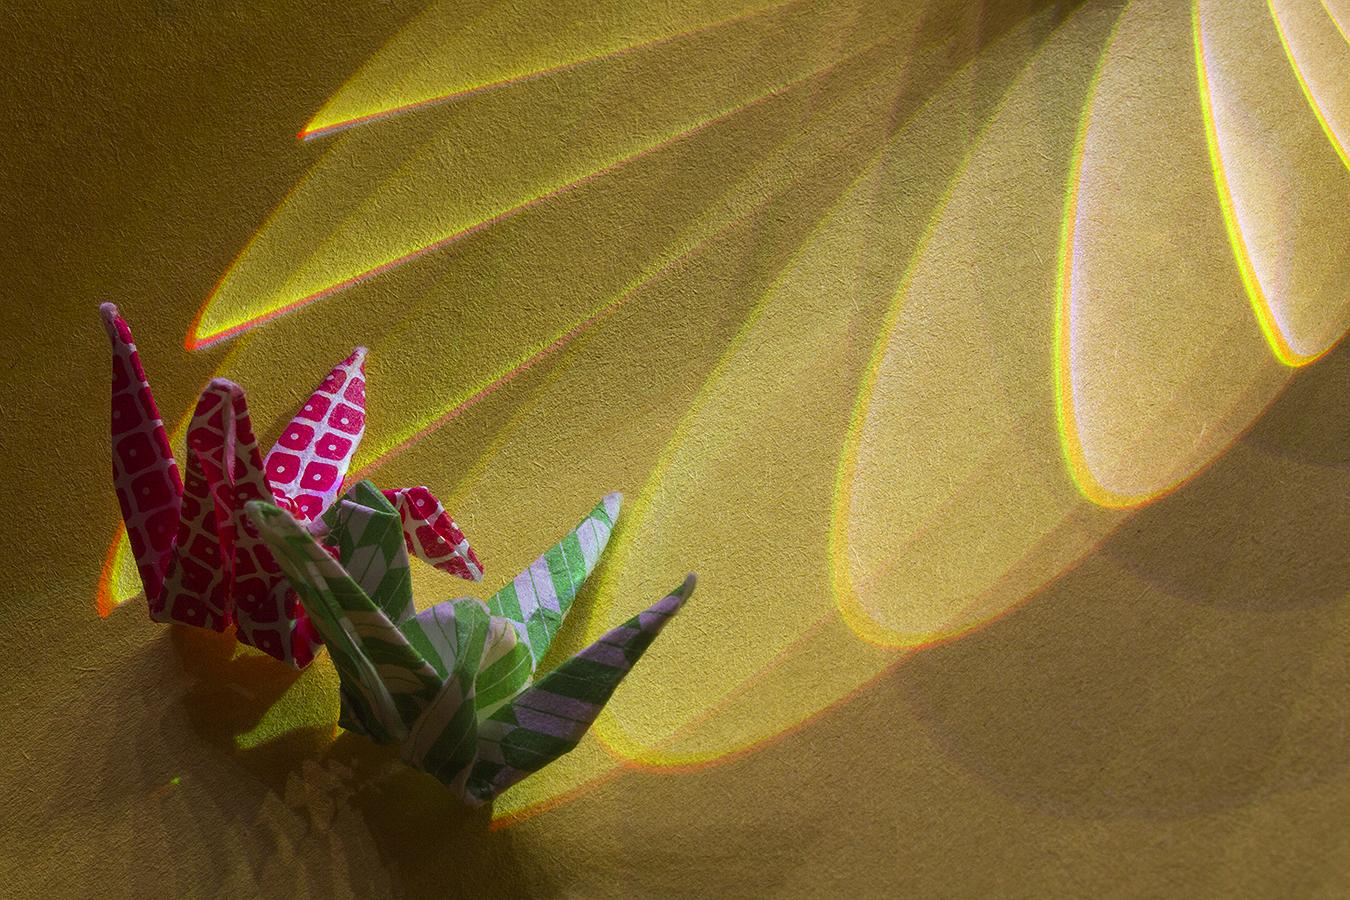 9_Gold_Jonathan_Tang_UPenn_Tony_Ward_Studio_Long_Exposure_Low_Light_LED_Optics_Origami_Paper_Wing